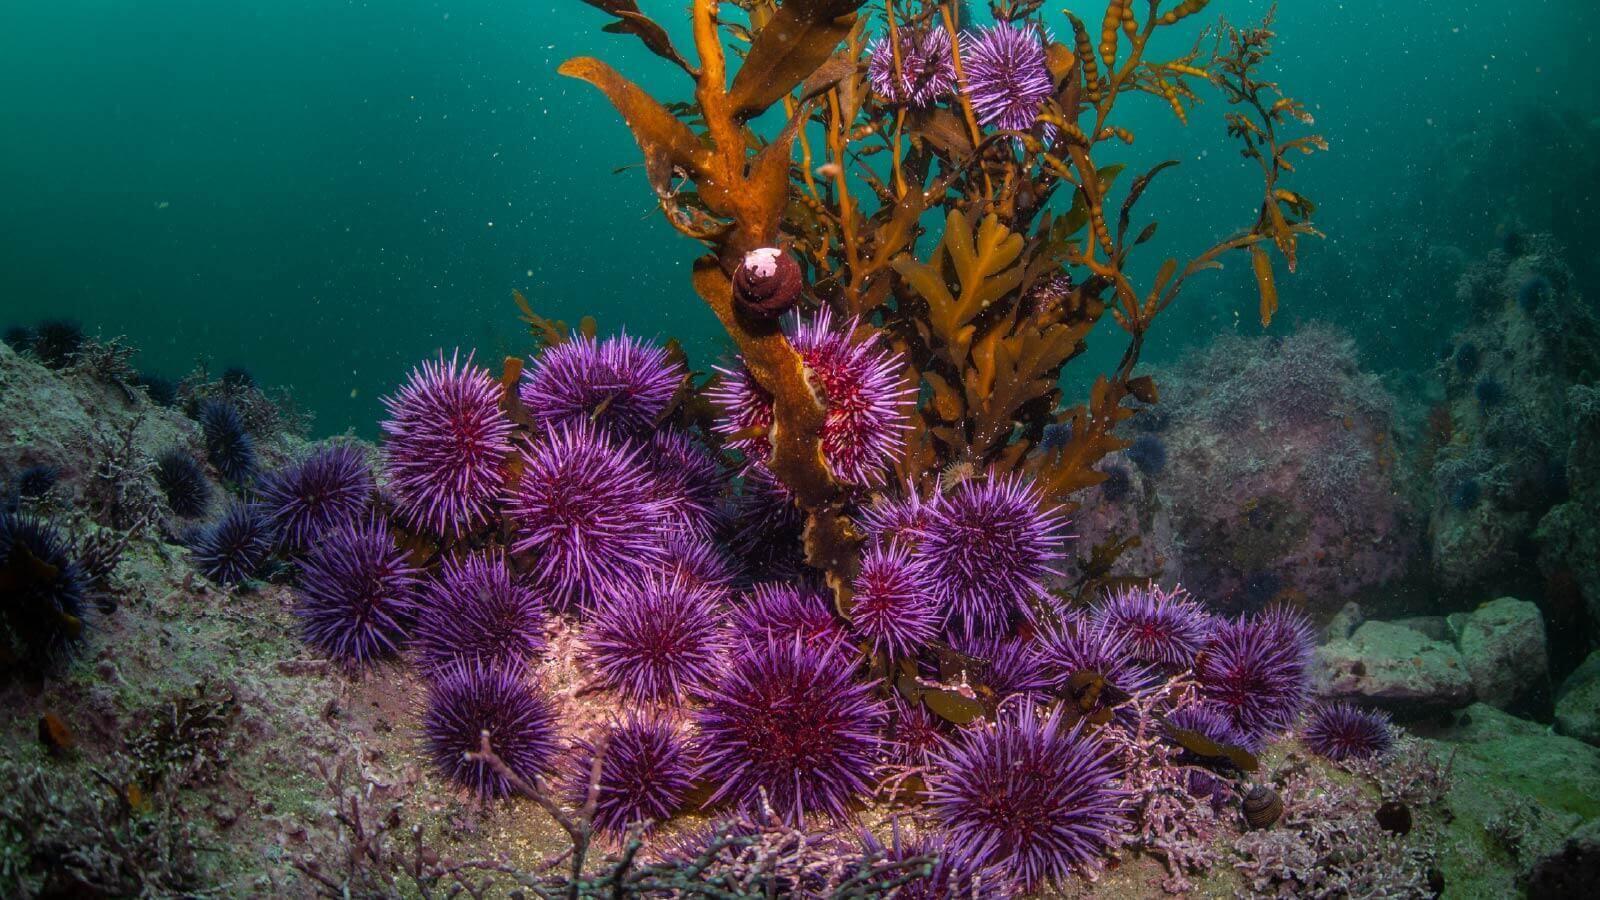 Saving California's kelp forests